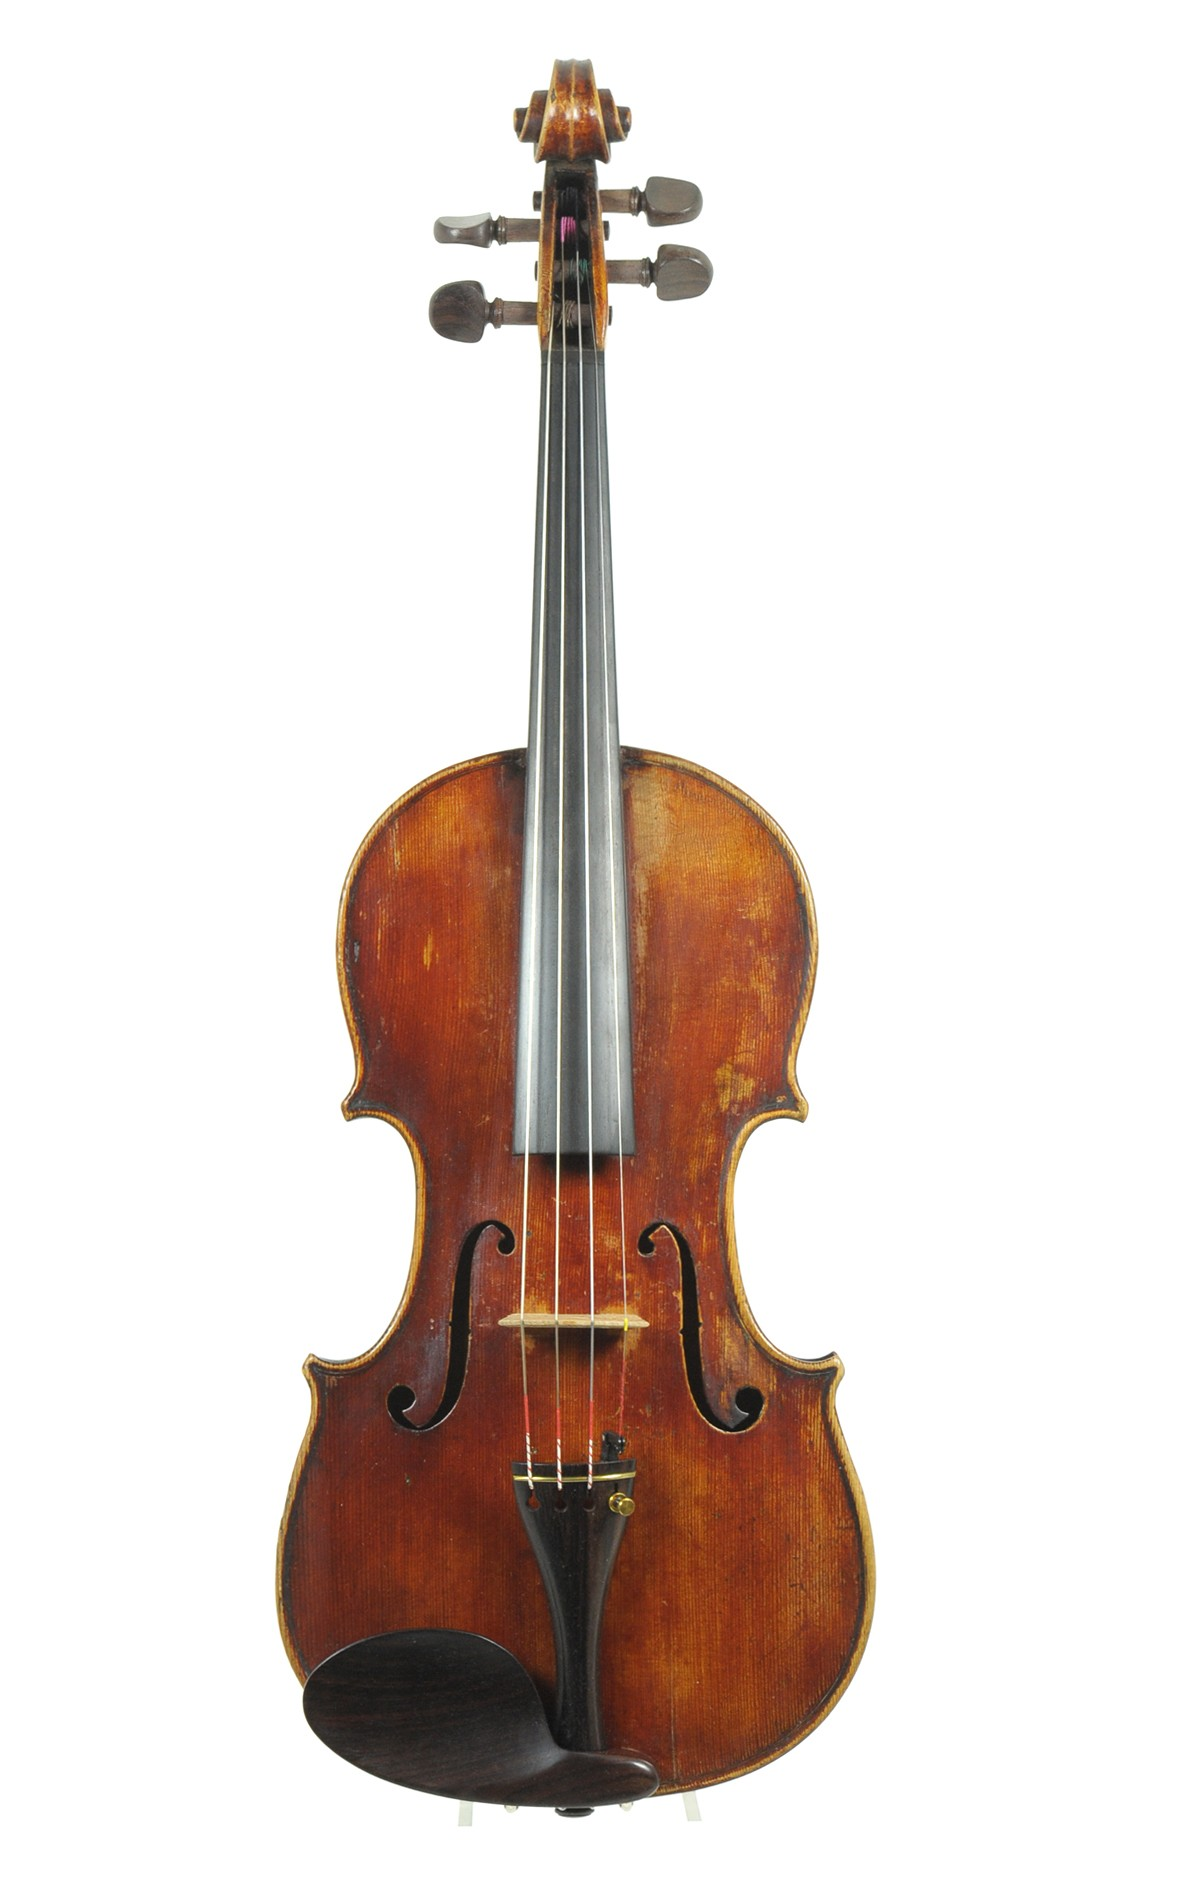 Johann Hornsteiner, Passau, violin dated approximately 1900